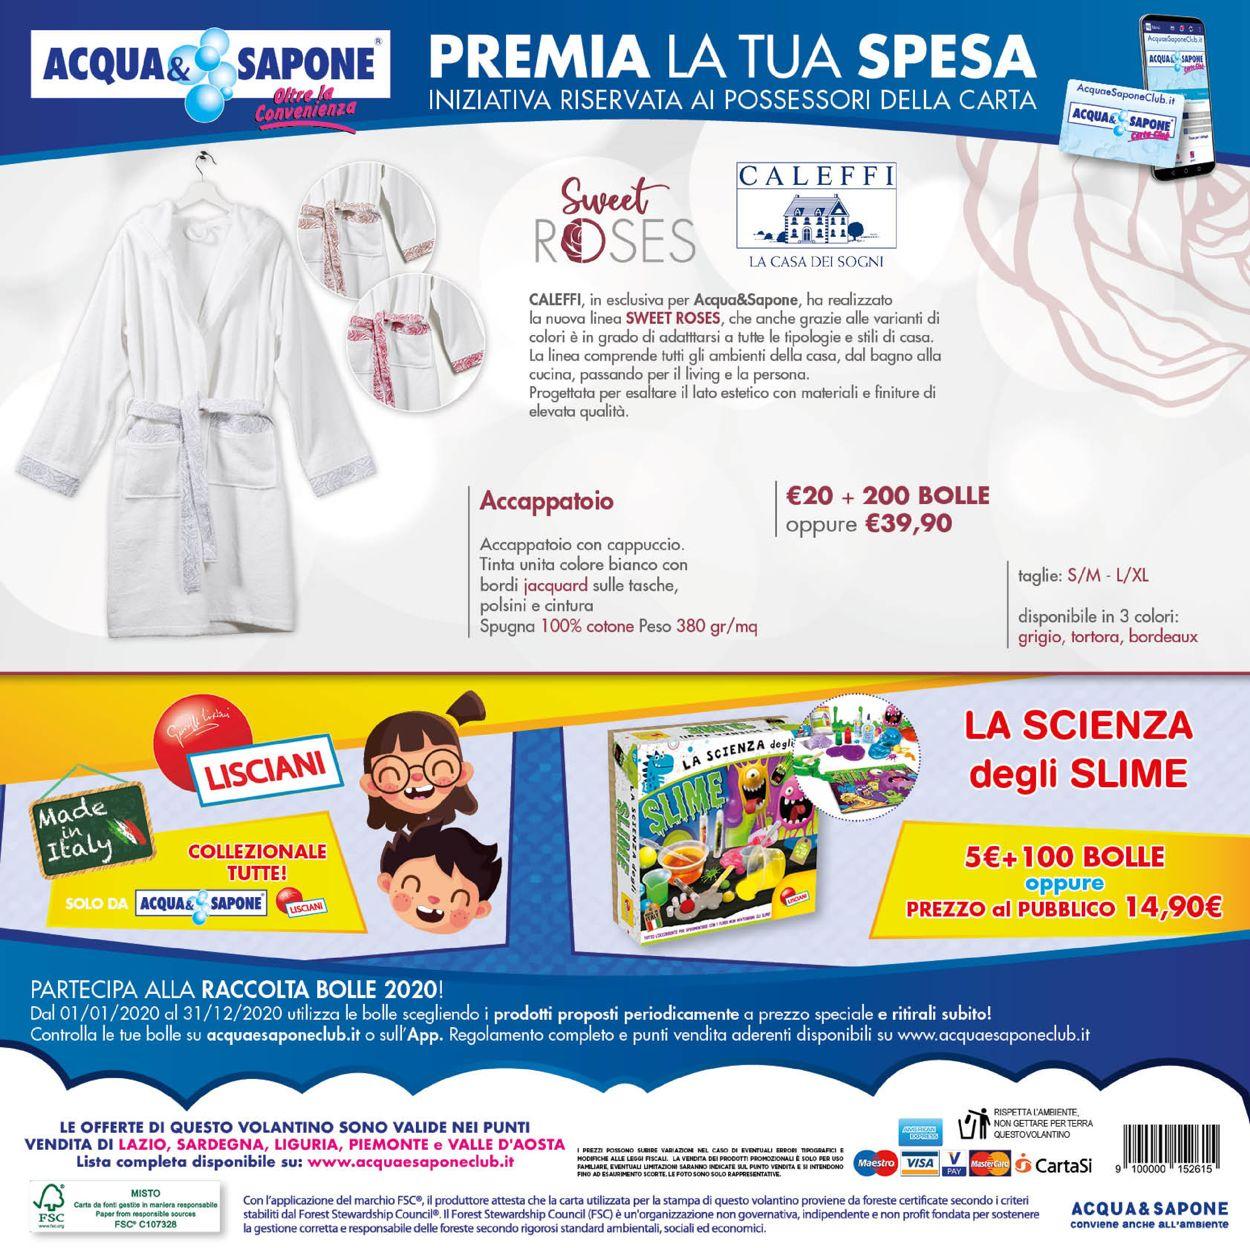 Volantino Acqua & Sapone - Offerte 01/12-31/12/2020